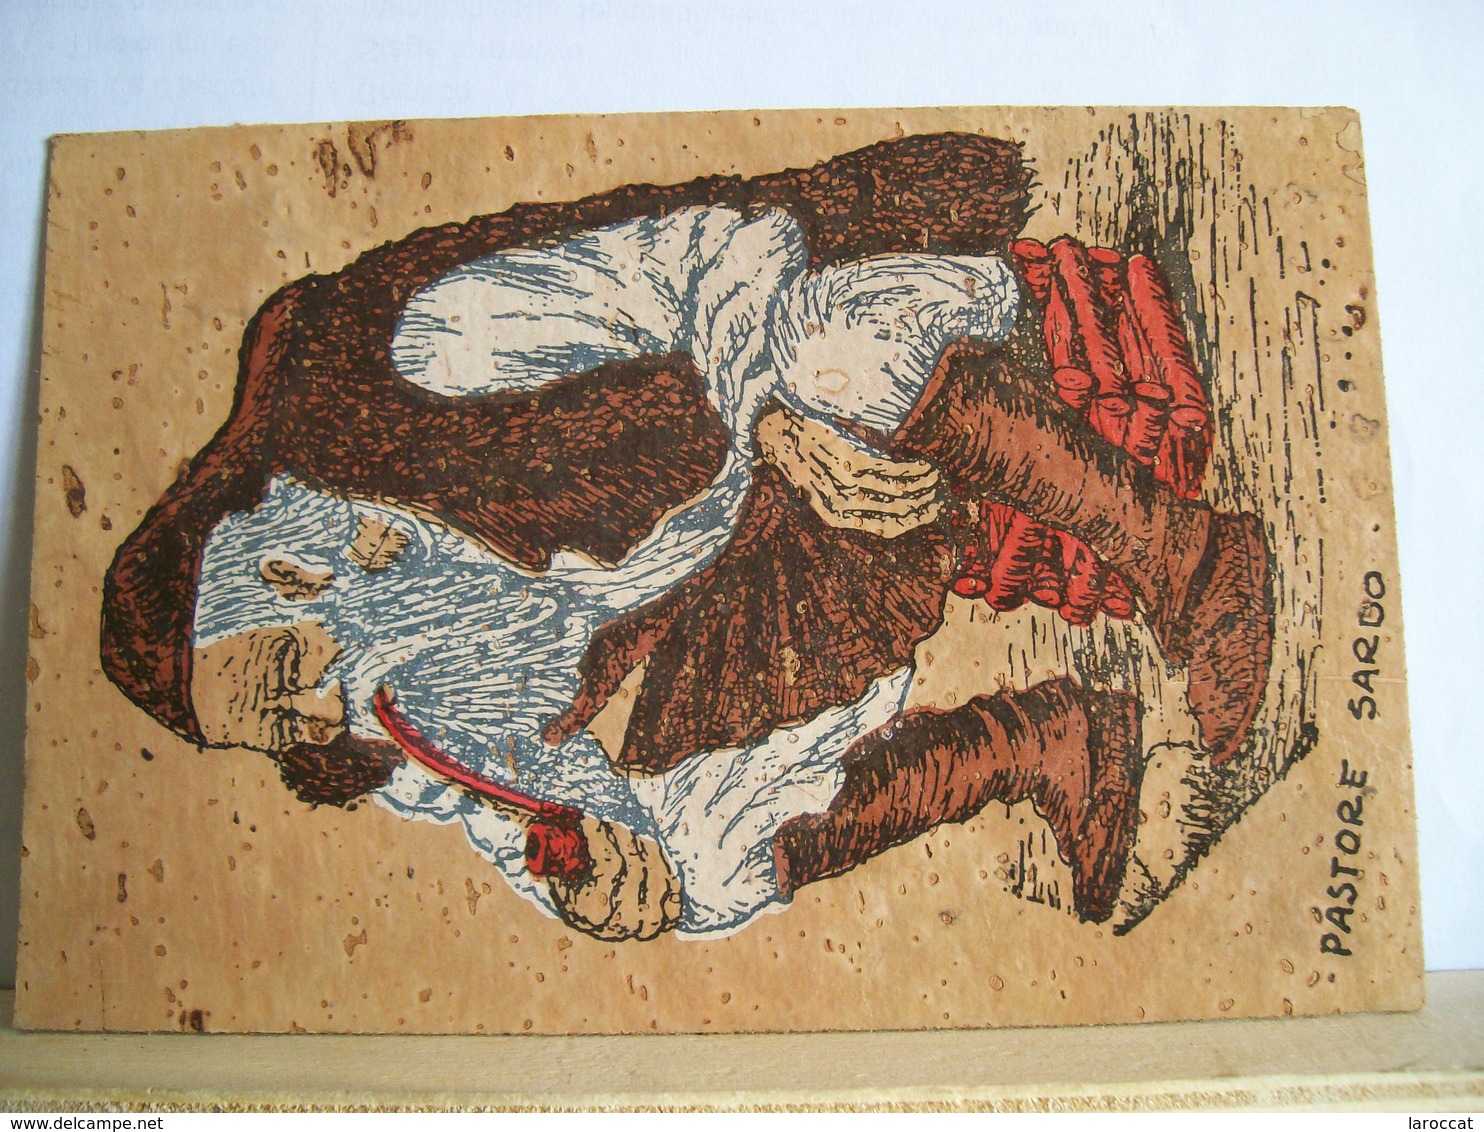 1980 - Olbia - Cartolina  Artistica Di Sughero - Pastore Sardo (Fausto Tamponi) Calangianus - Folklore Costume - Cartoline